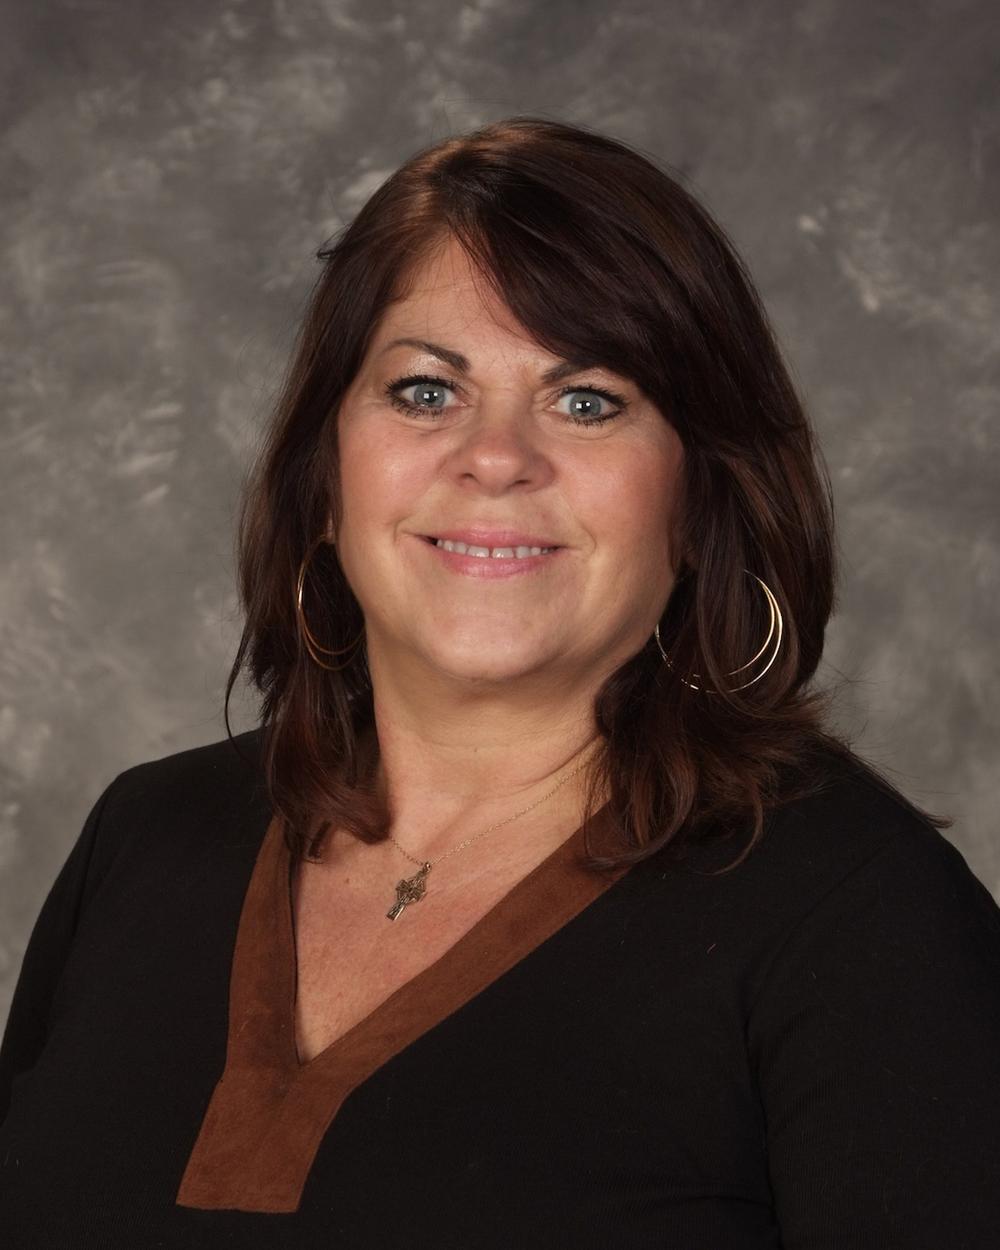 Brenda Basalla, Business Manager